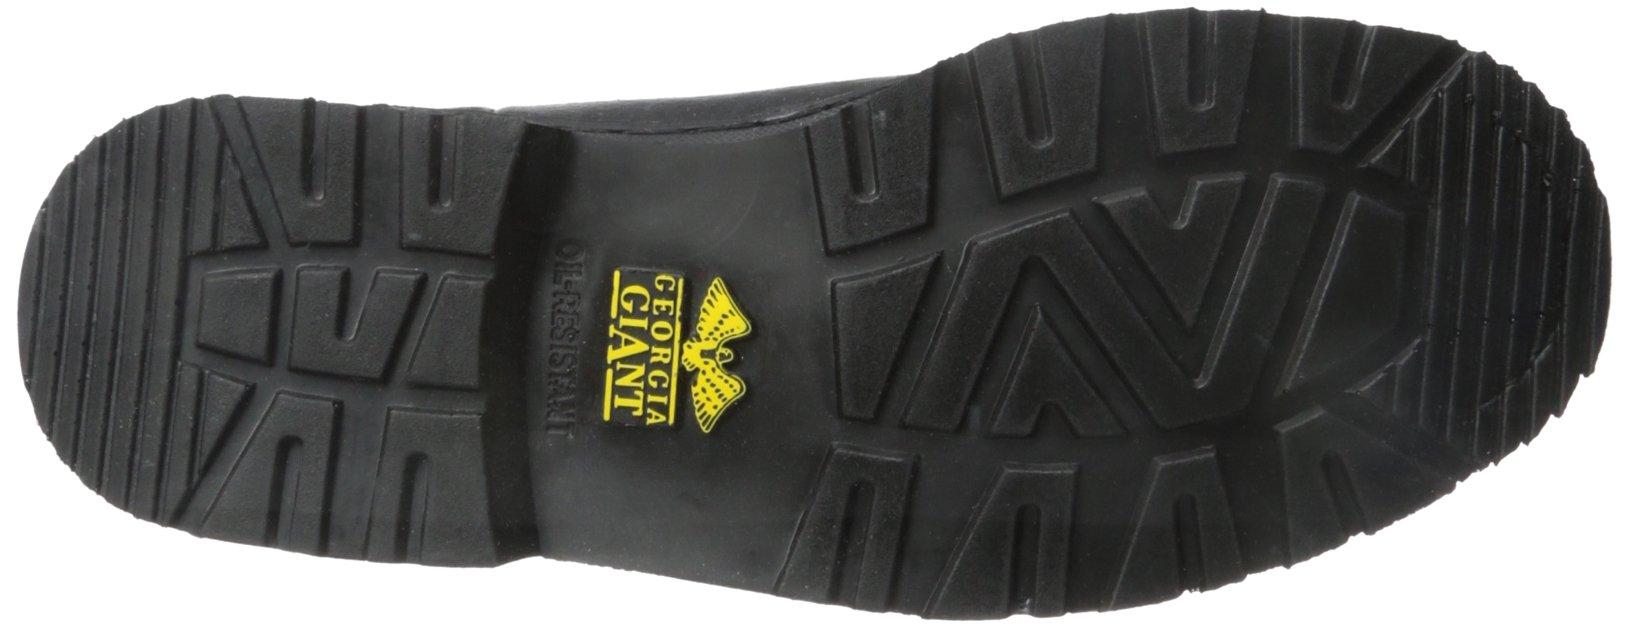 Georgia Boot Men's Twin Gore Romeo GR270 Work Boot,Black,6.5 M US by Georgia (Image #3)